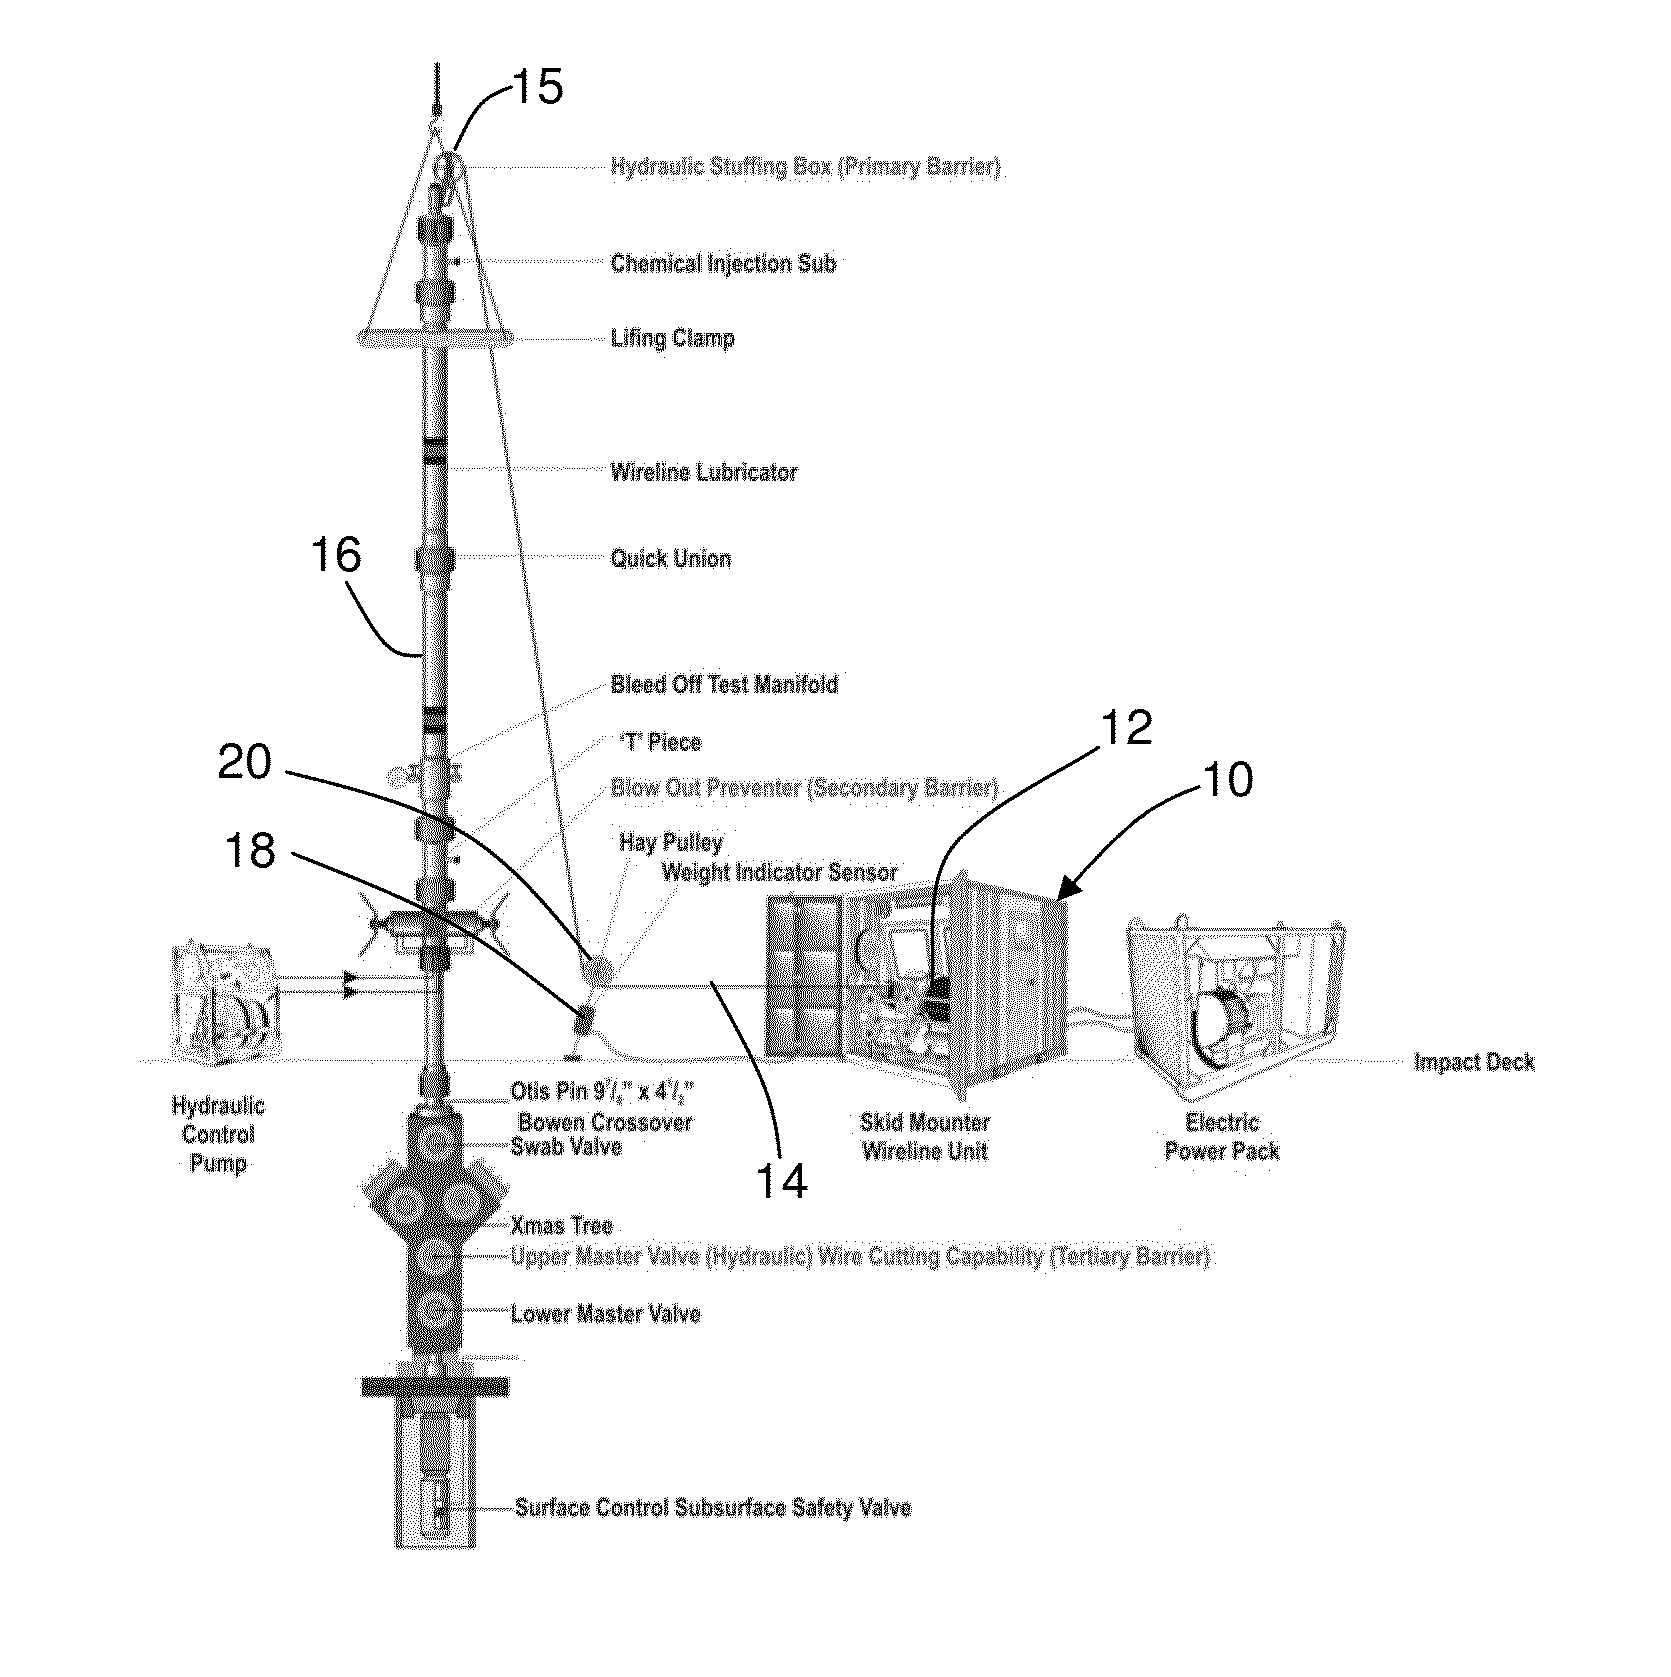 wireline diagrams patent us20140174727 - wireline apparatus - google patents